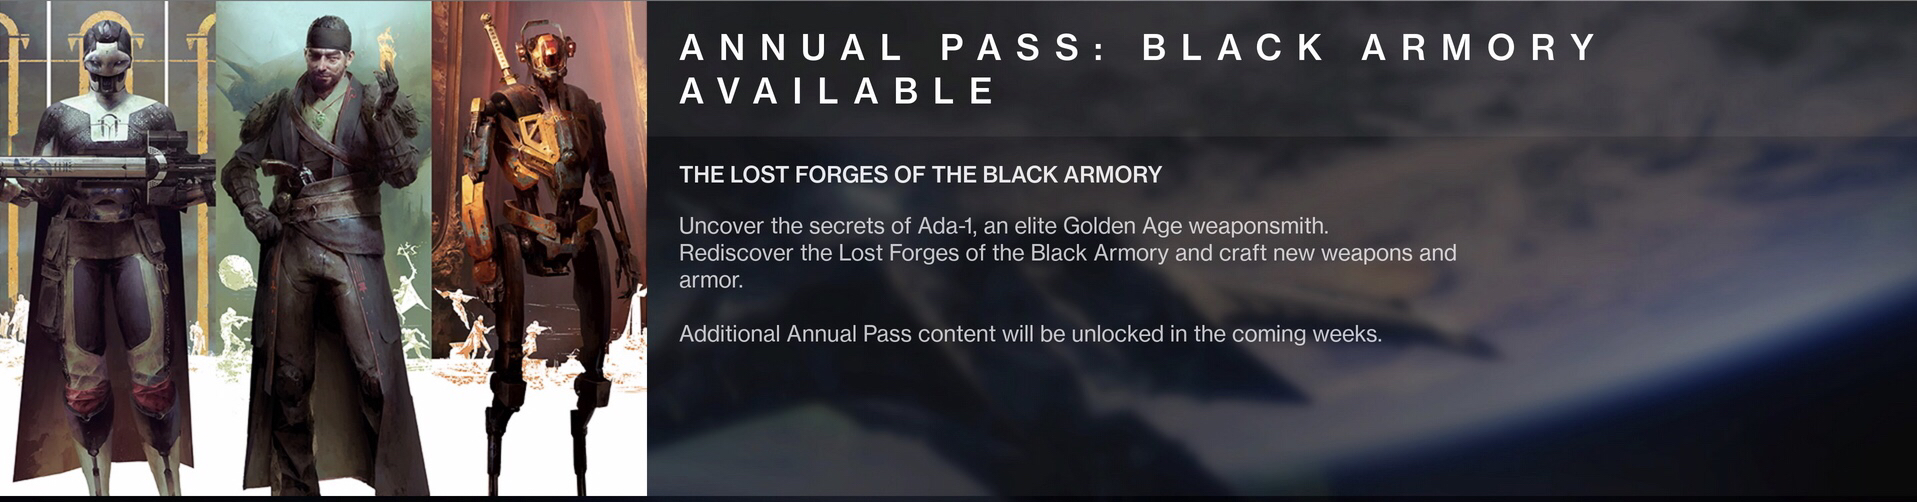 82775b3a5e7 Destiny 2  Black Armory DLC Launches — Steemit